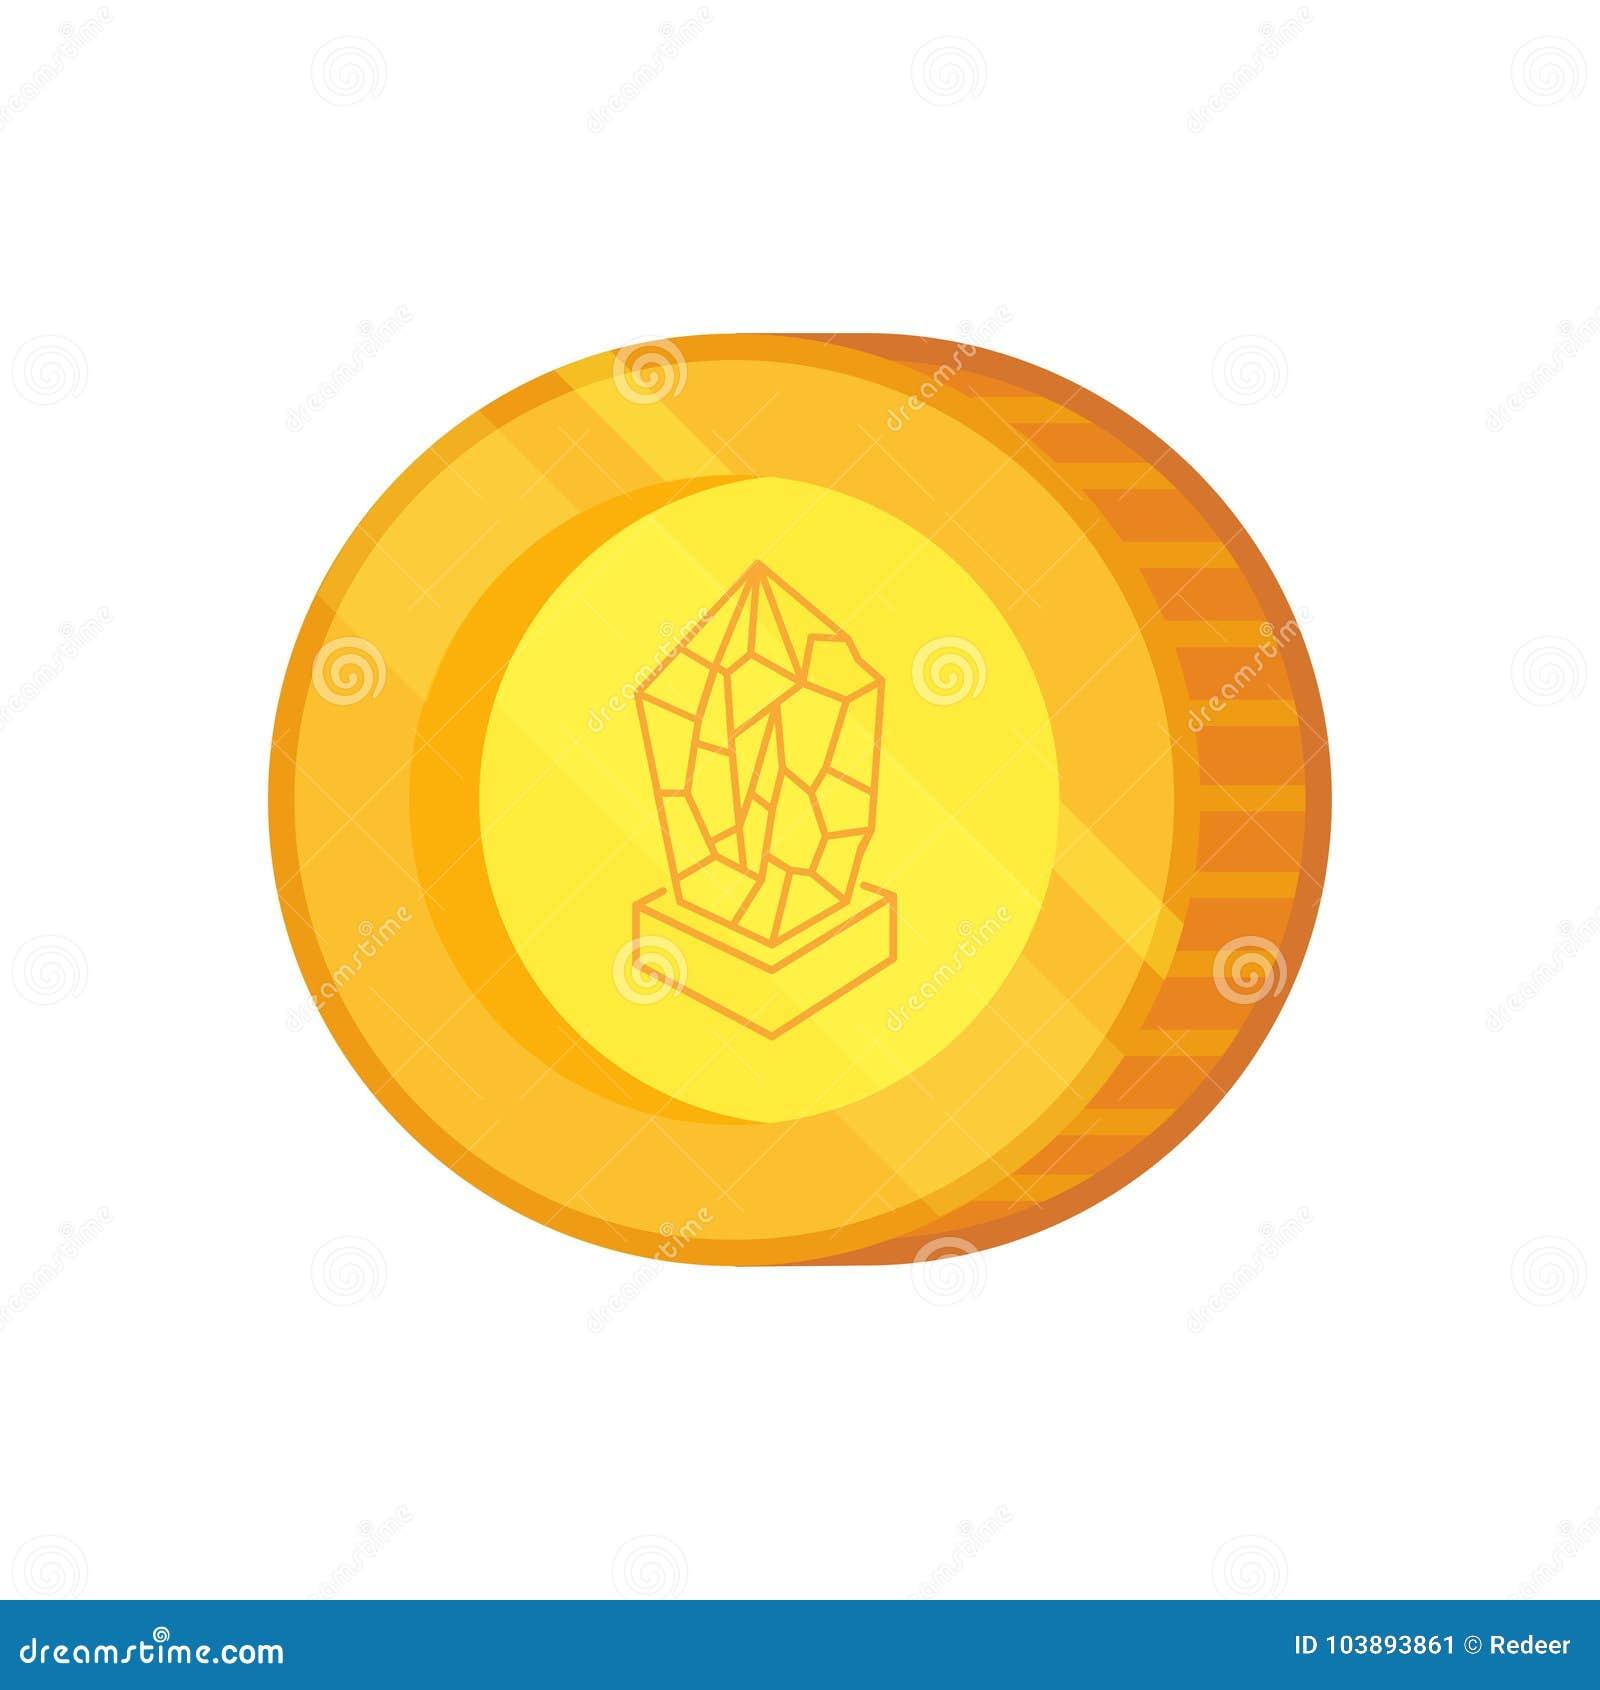 lisk cryptocurrency market cap